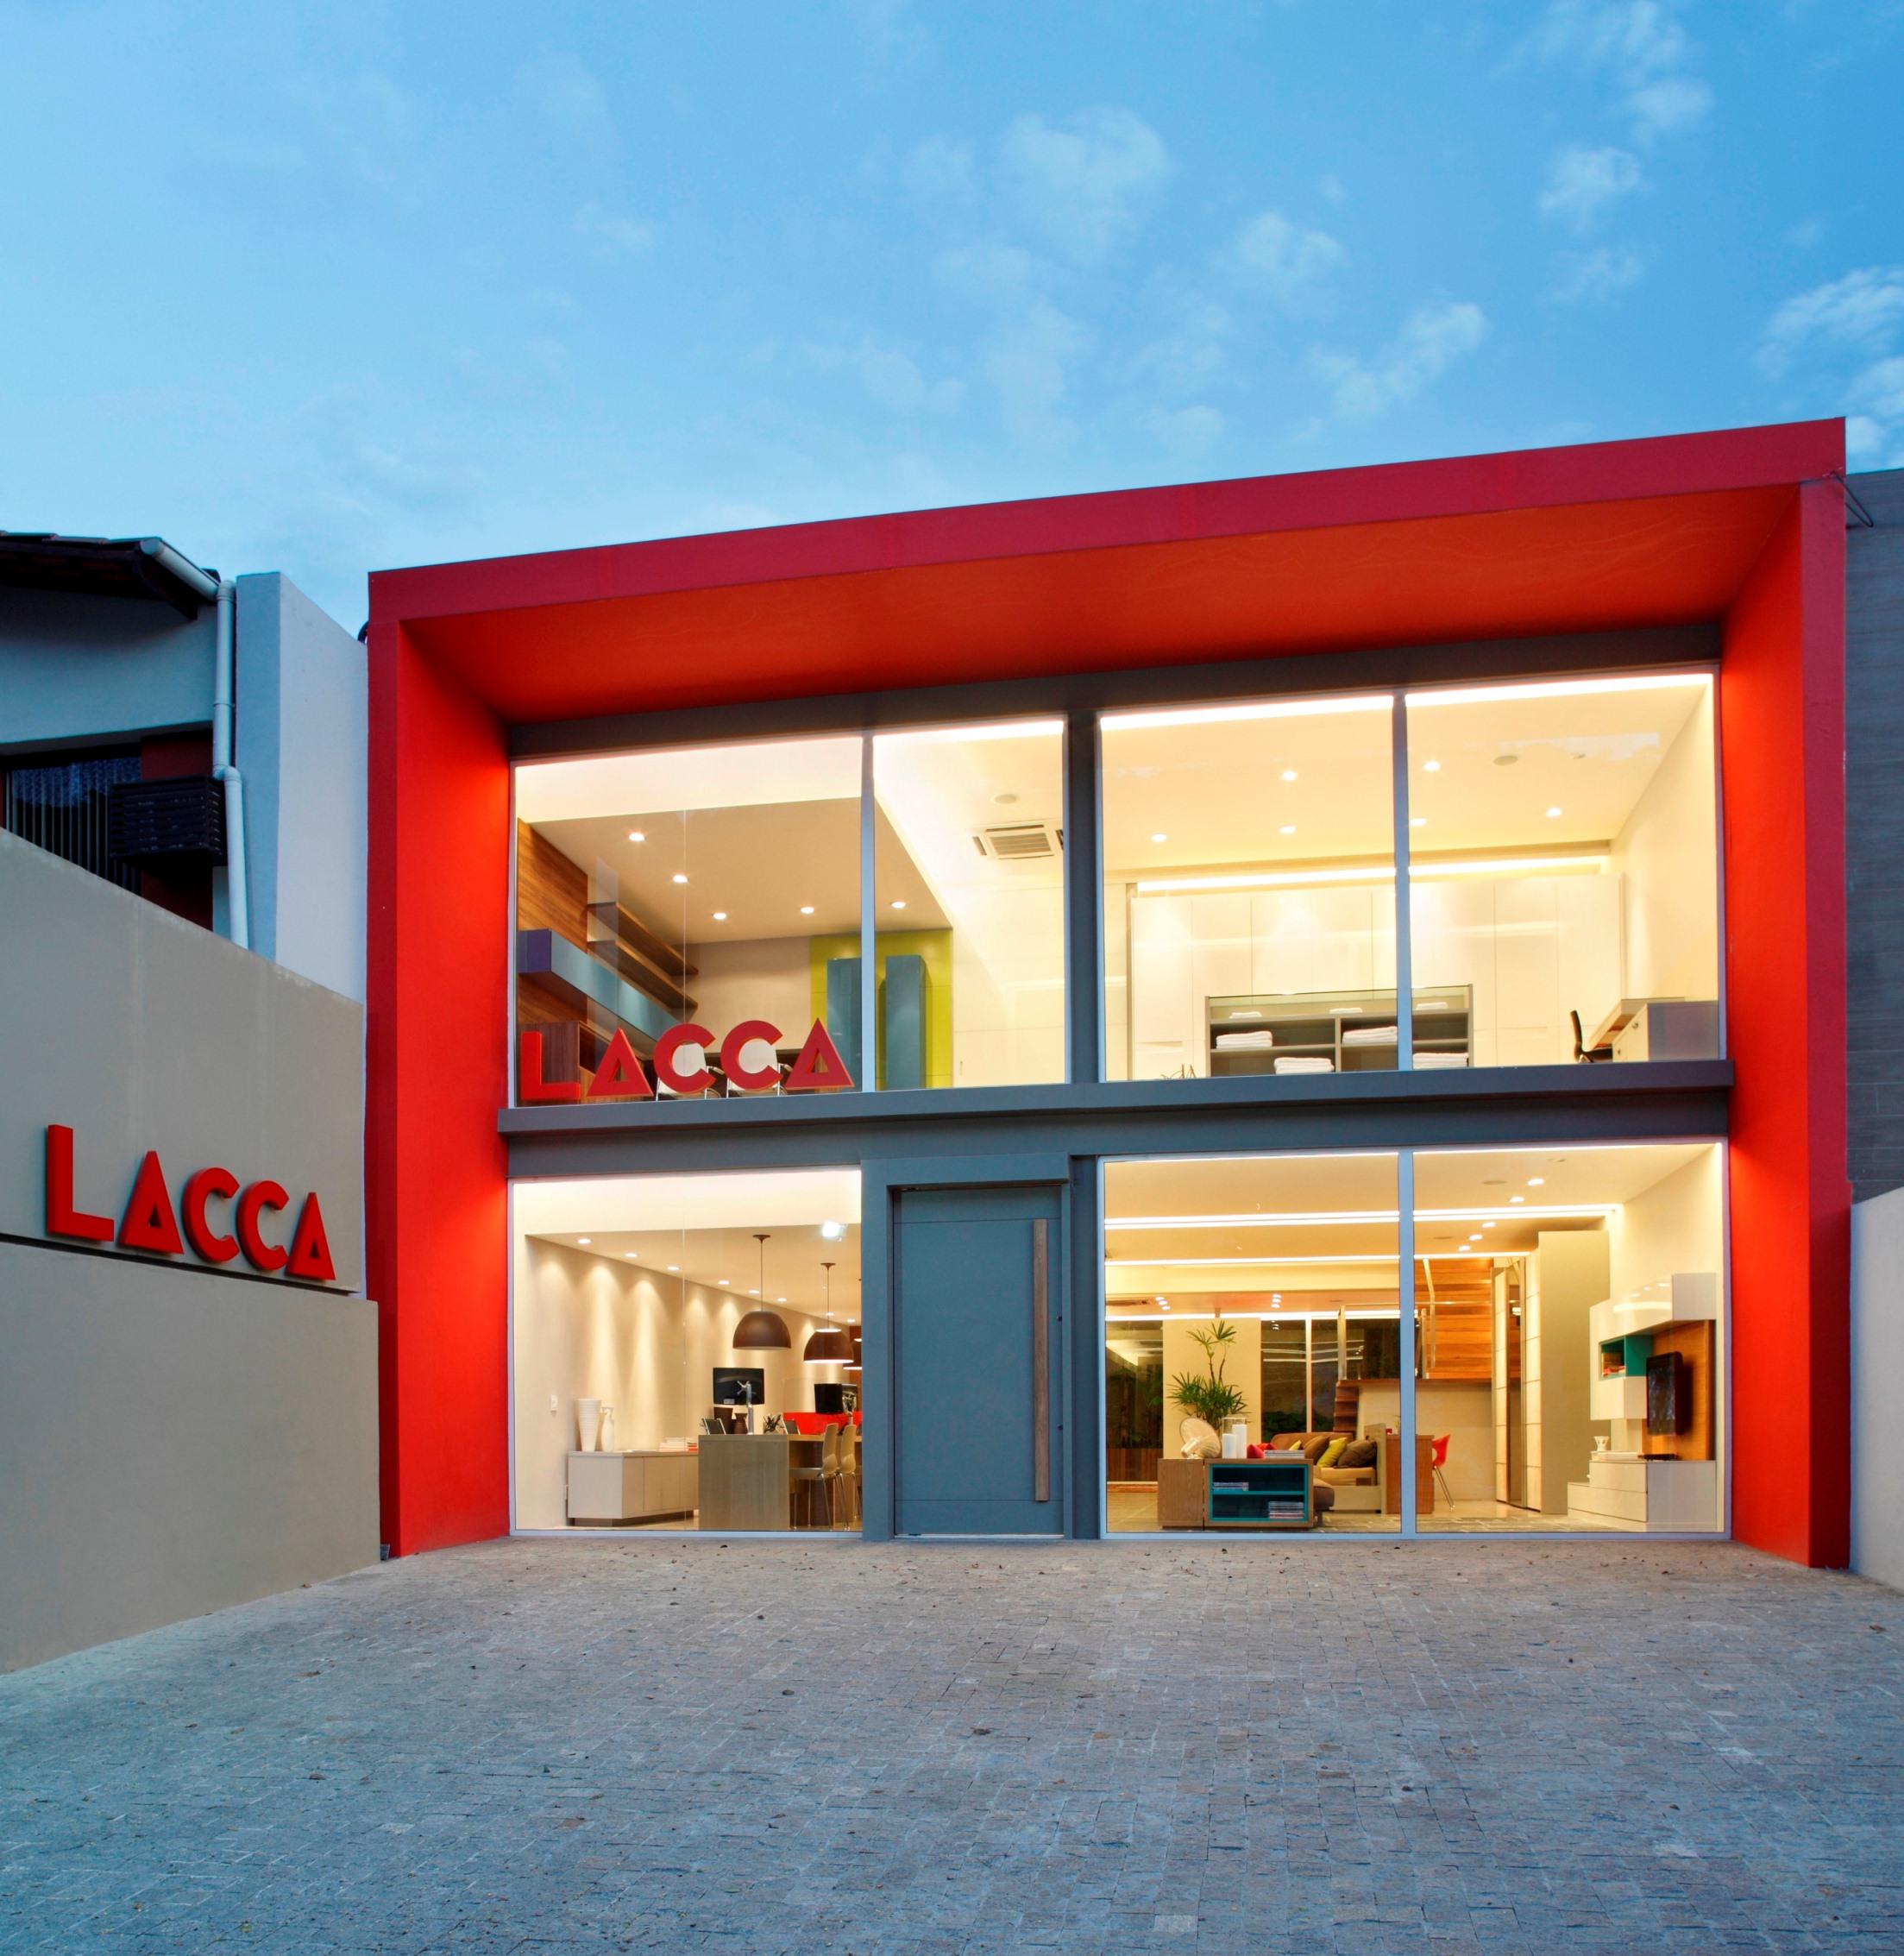 Lacca abre nova loja em Niterói